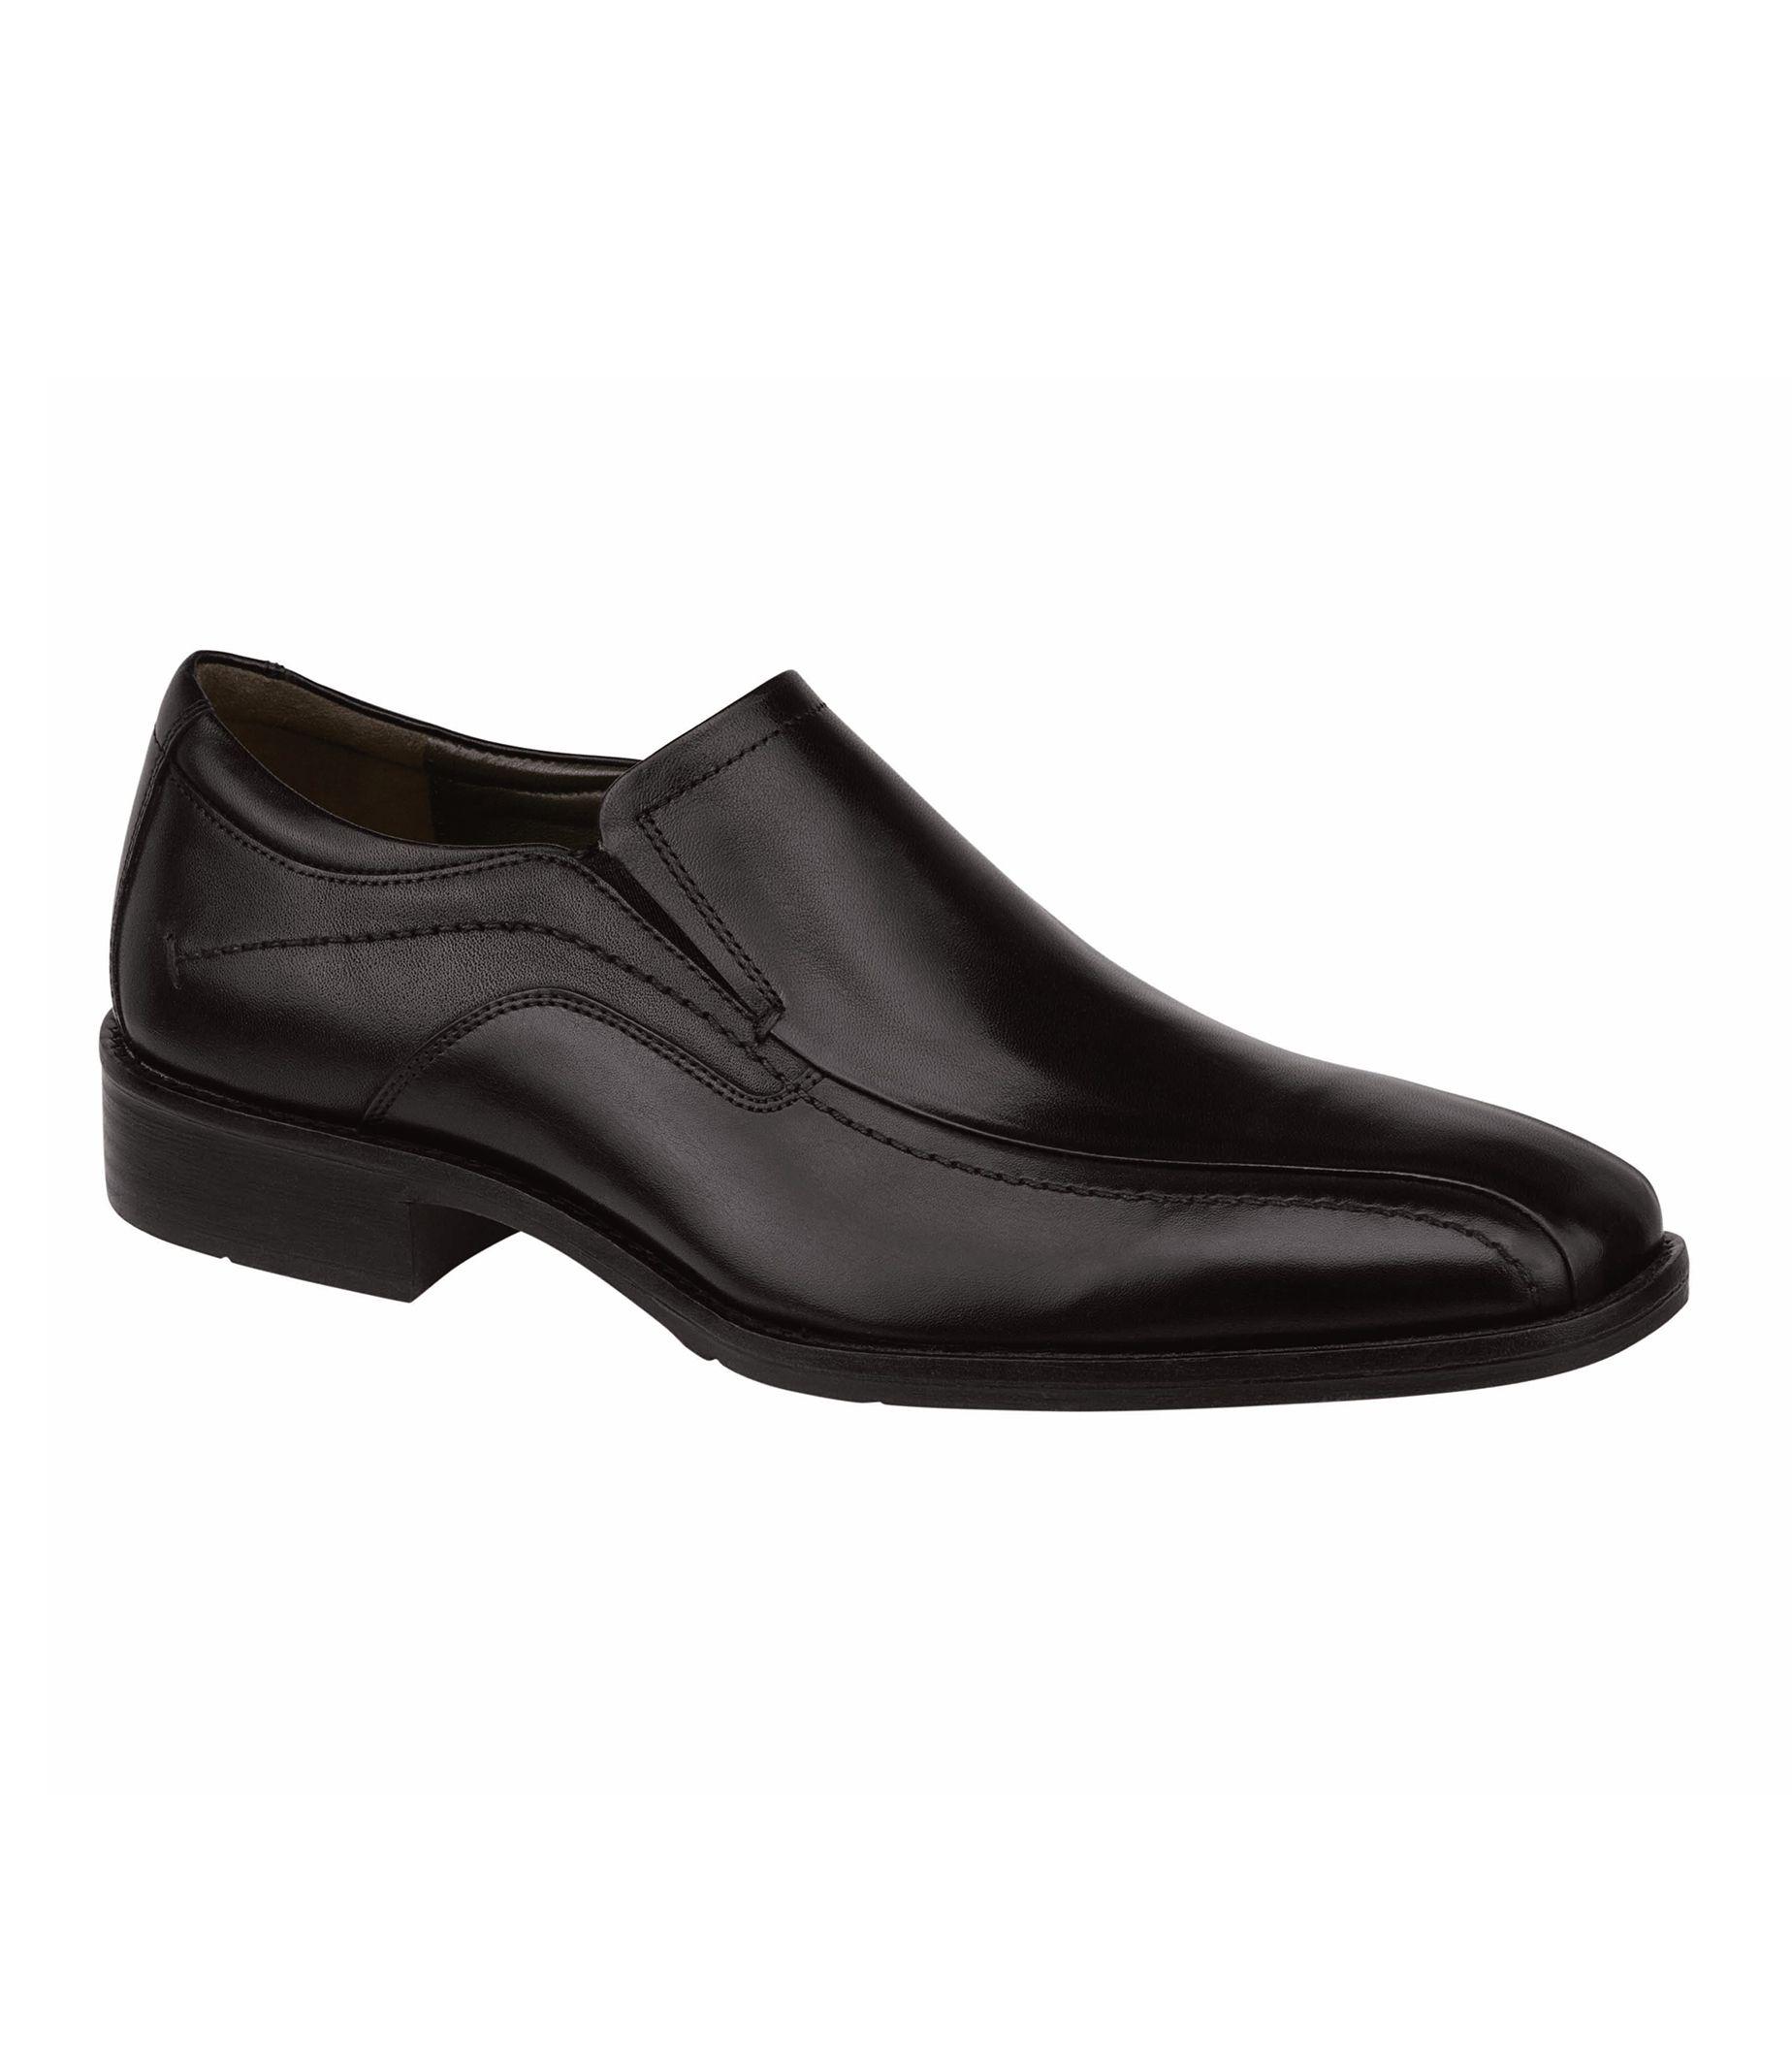 Larsey Runoff Moc Venetian Shoe by Johnston and Murphy